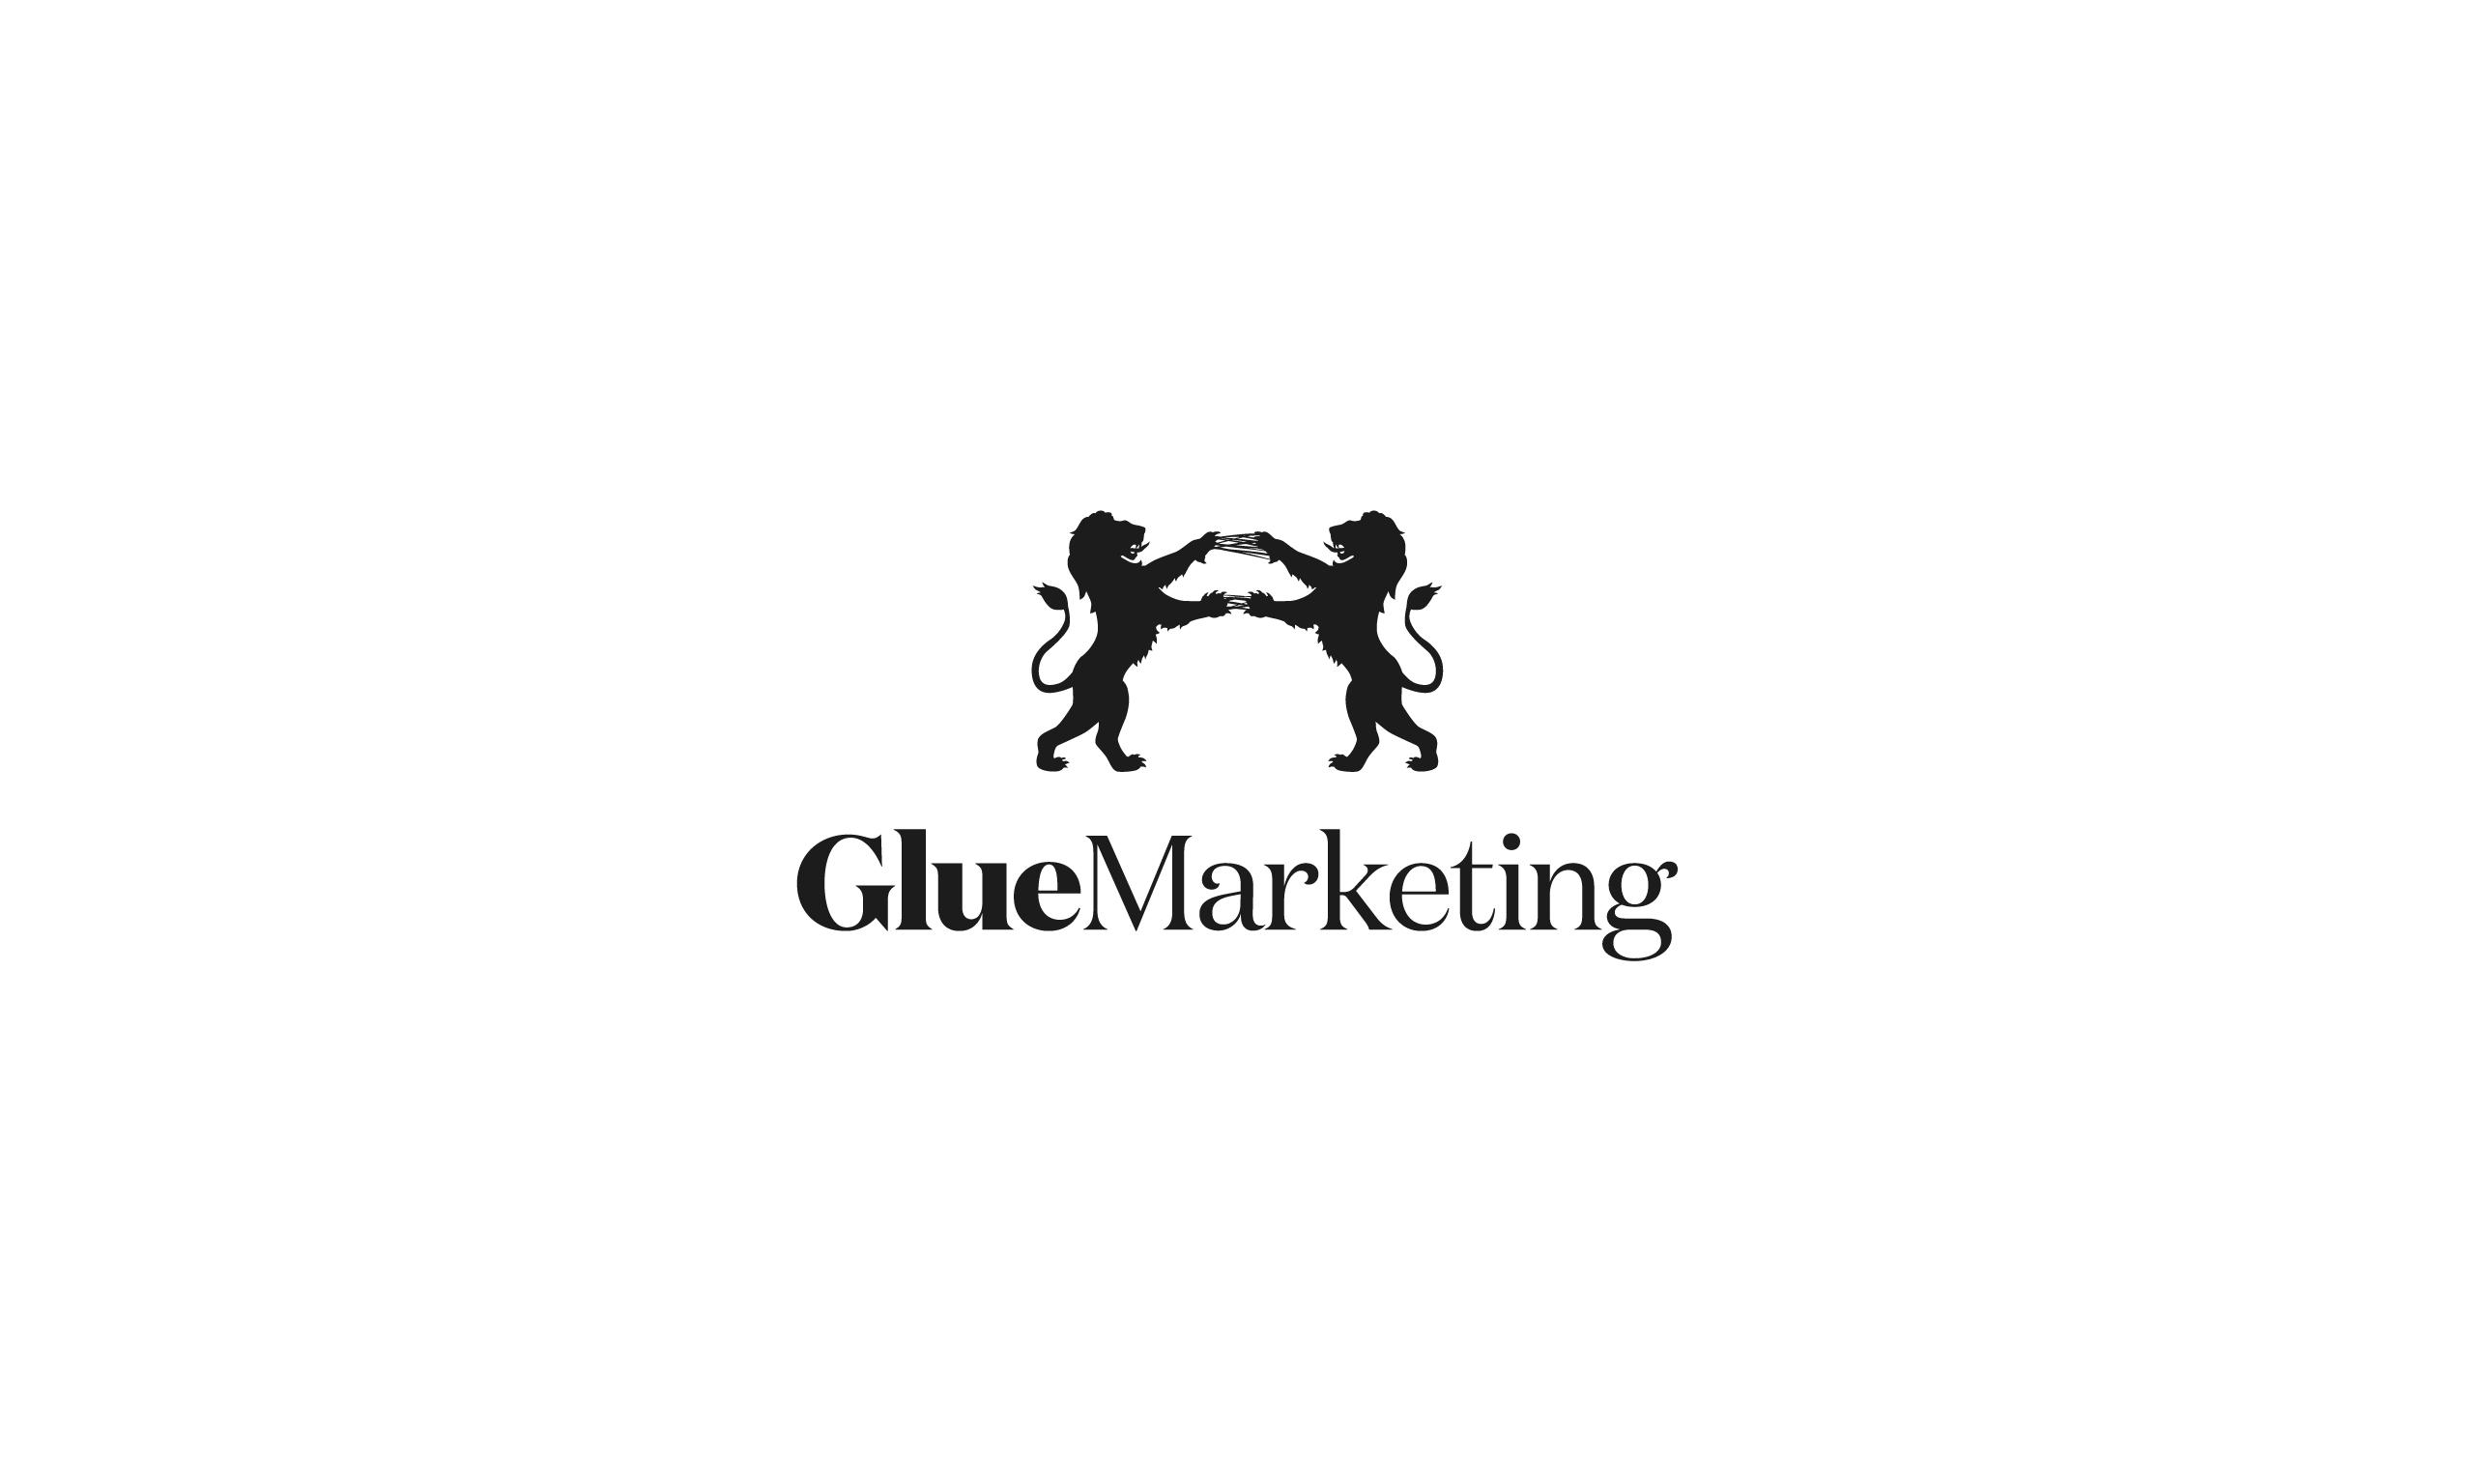 GlueLogoLockup